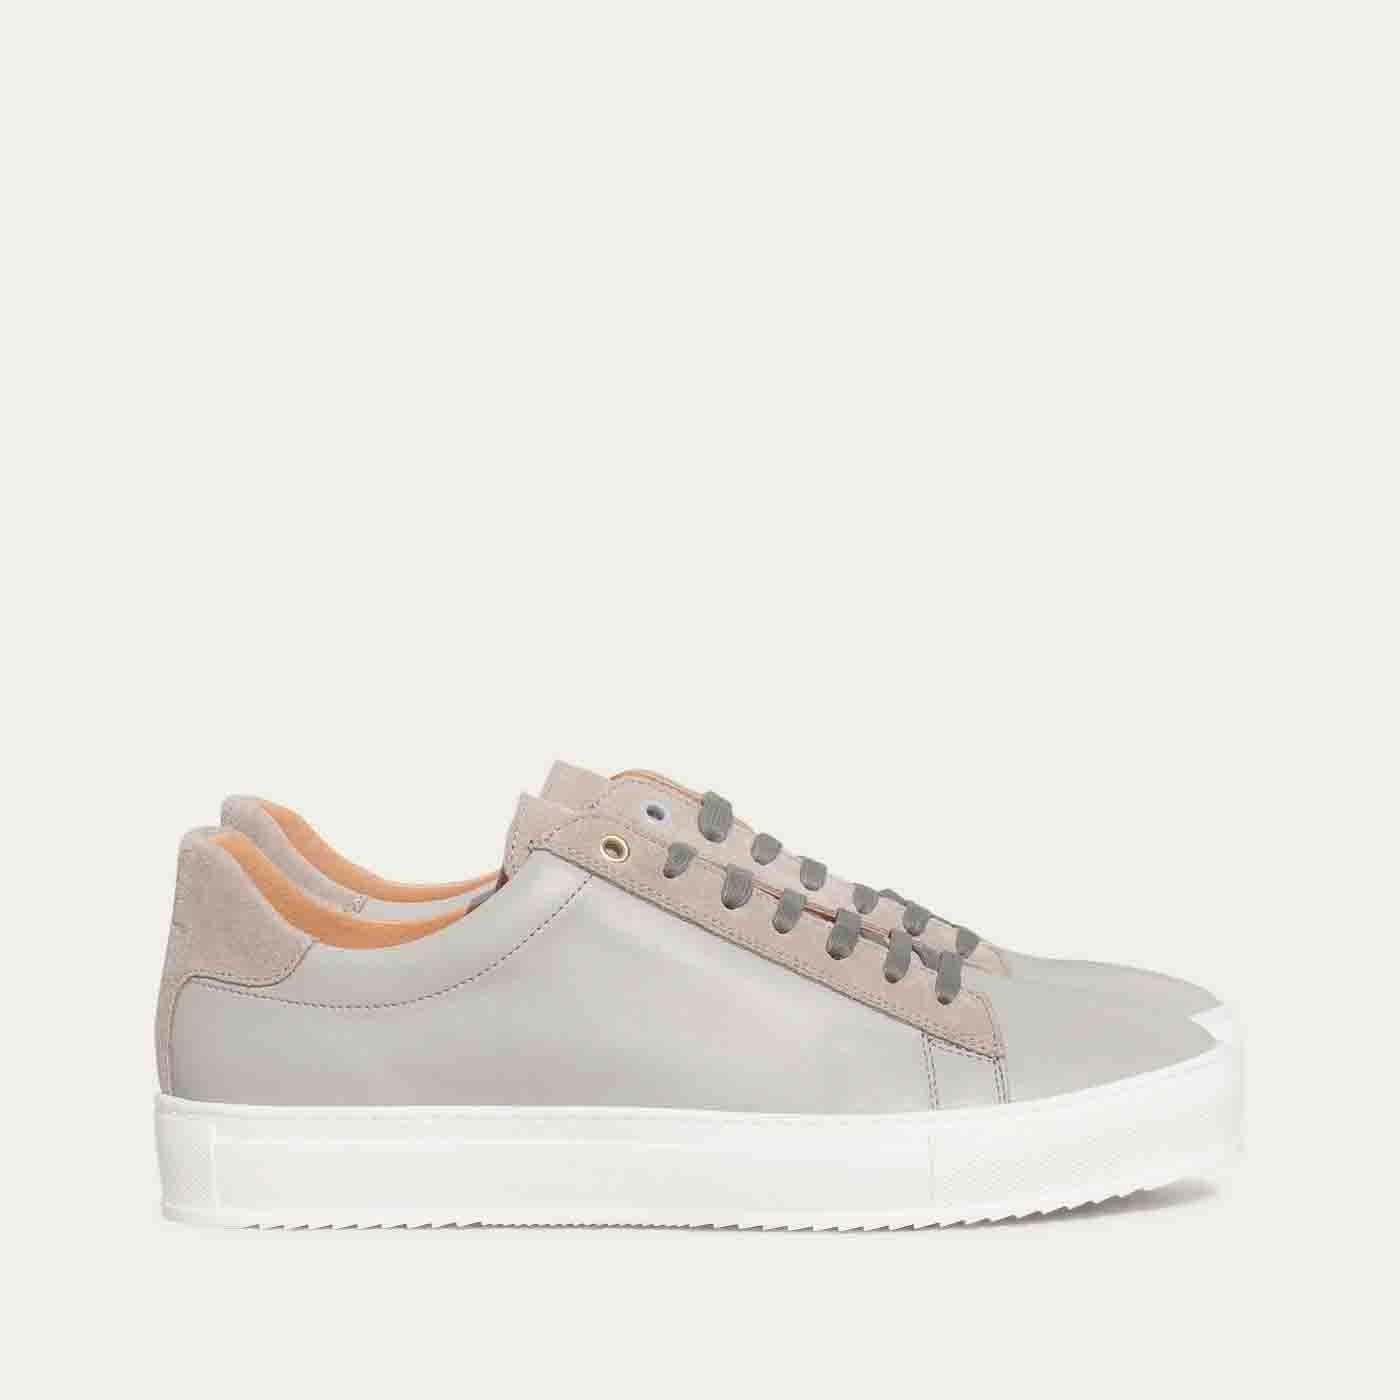 Pearl Grey Leather Taranta Sneakers   0